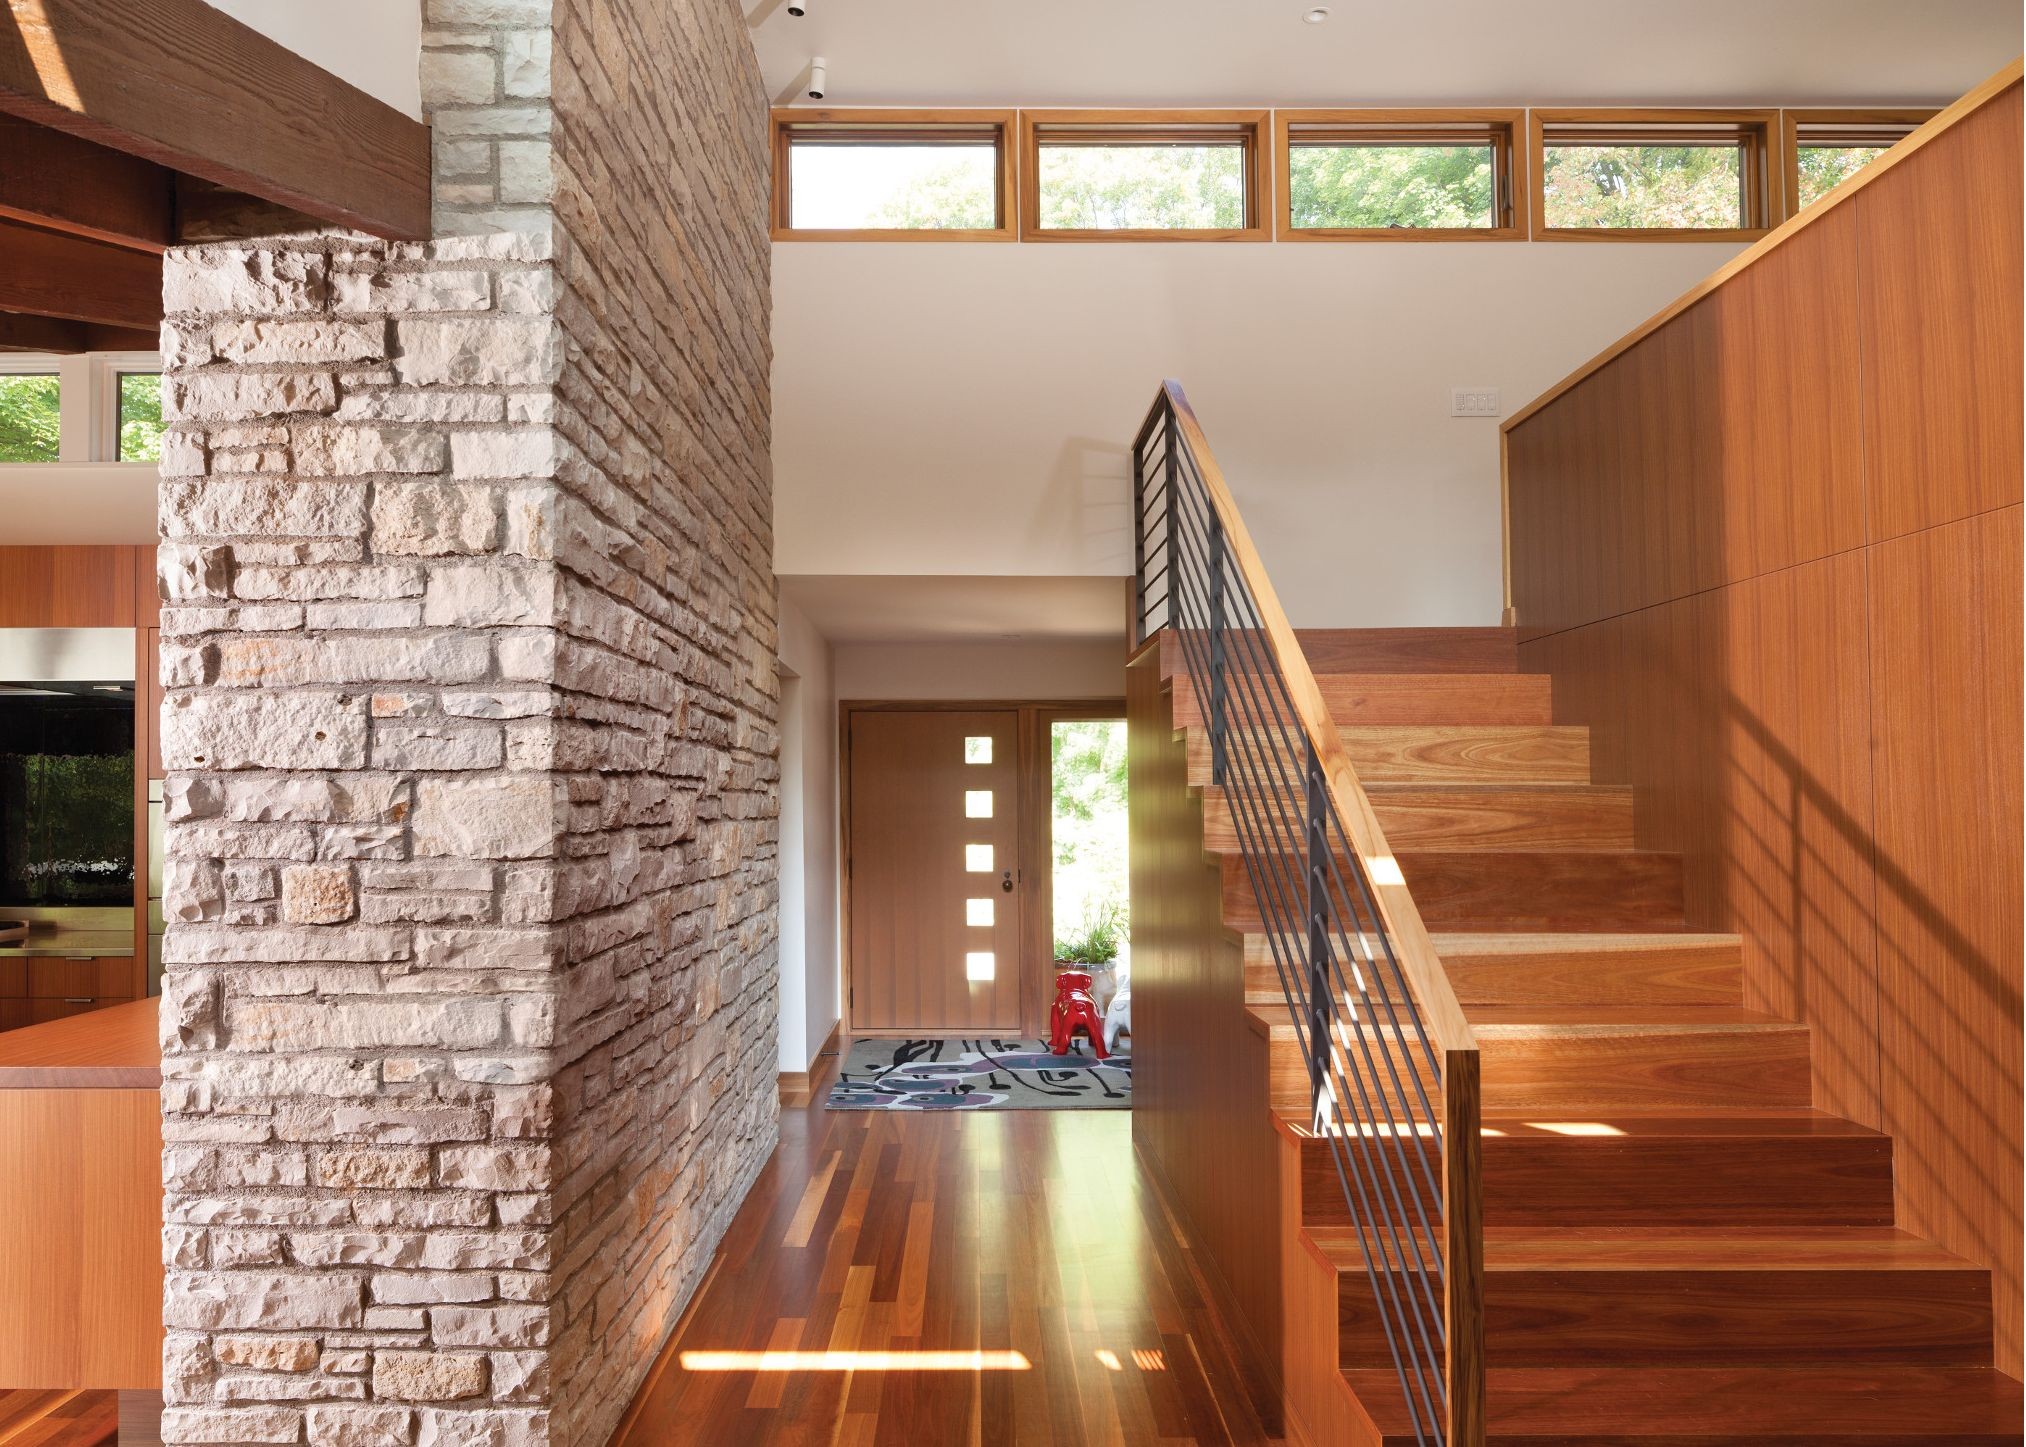 Cambria-quartz-countertop-entryway-stairwell